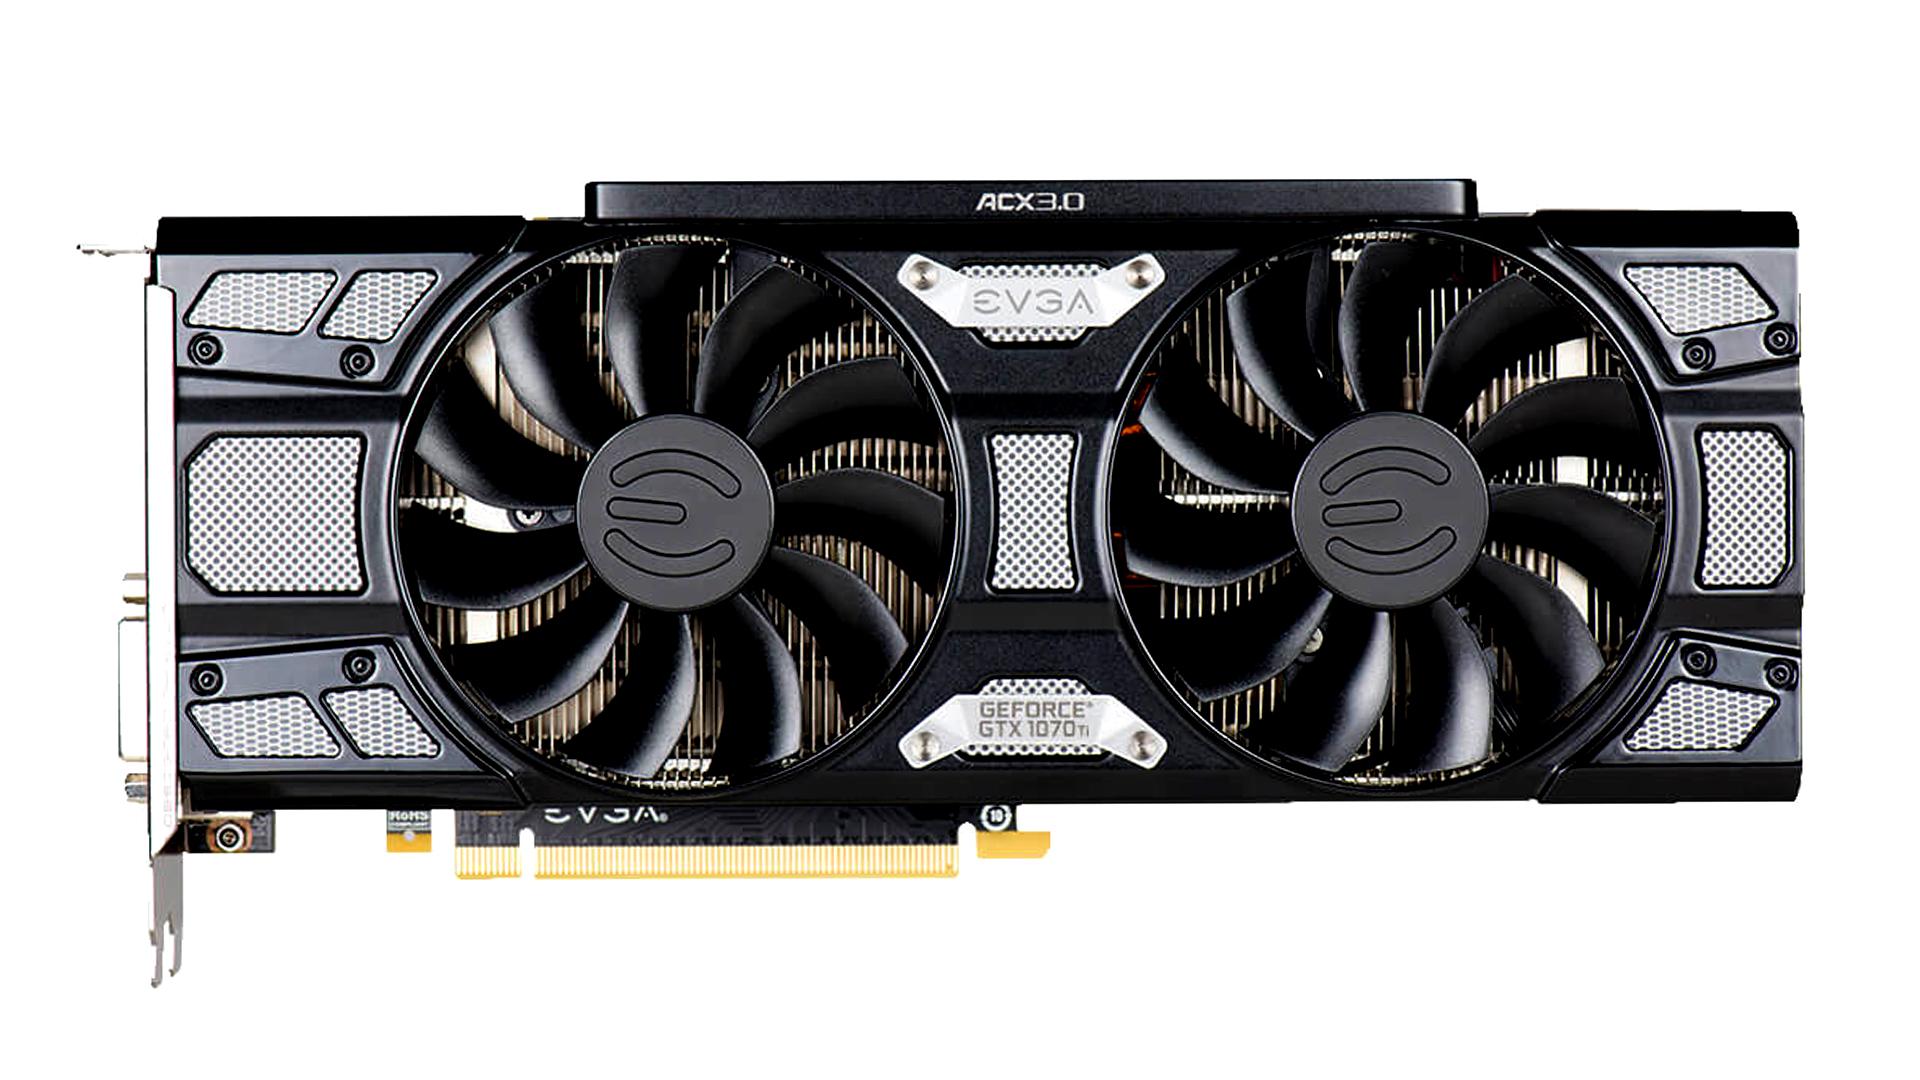 EVGA GeForce GTX 1070 Ti SC GAMING Black Edition Graphics Card